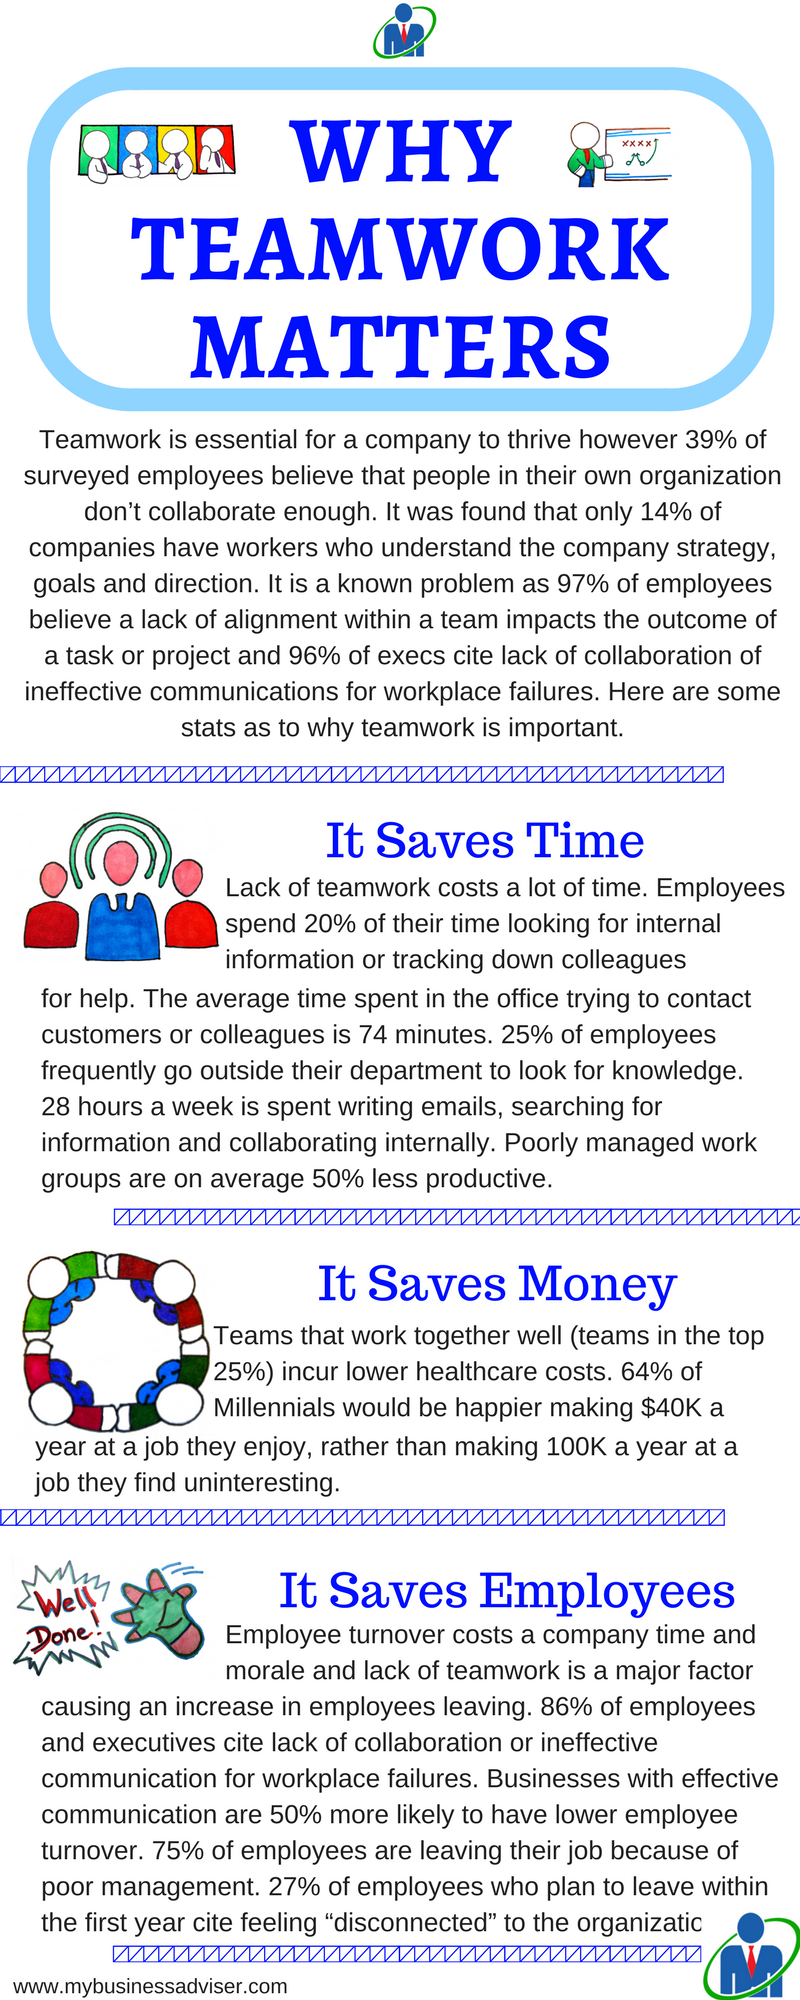 Team - Why teamwork matters